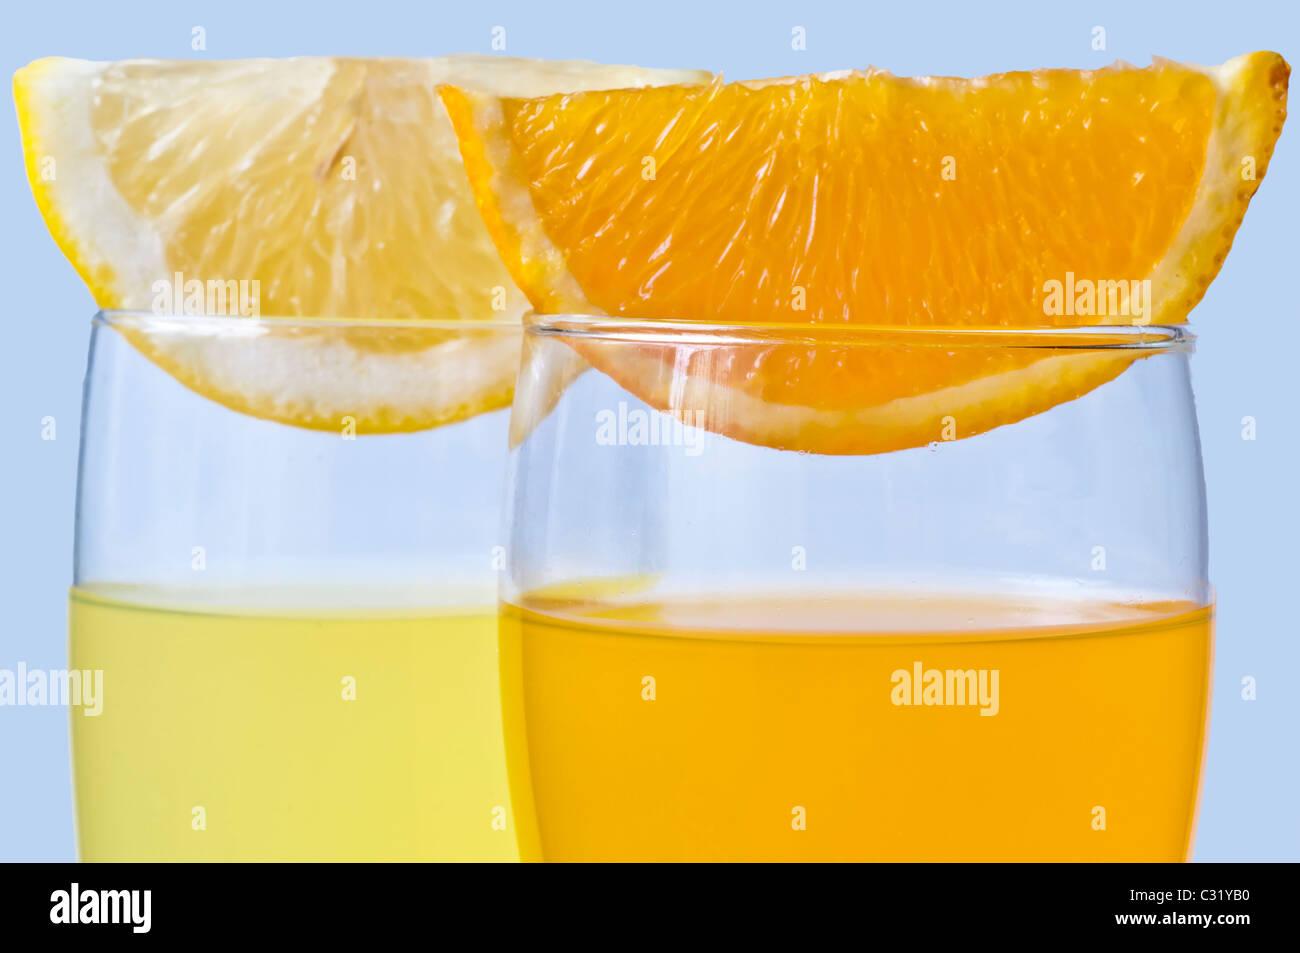 orange juice and lemon juice - Stock Image